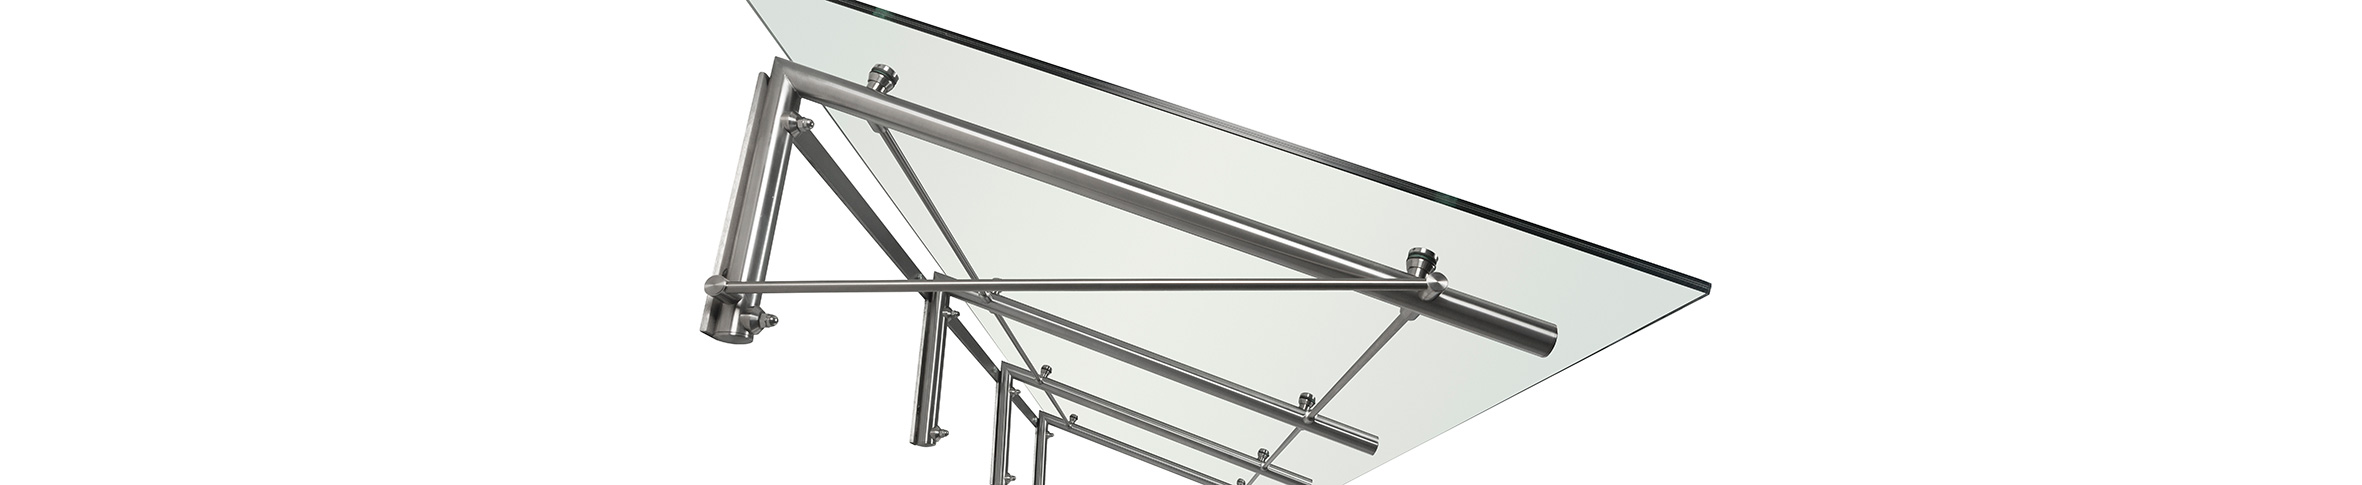 Comet-Vordach-Edelstahl-Haustür-Alu-Aluminium-Vordächer